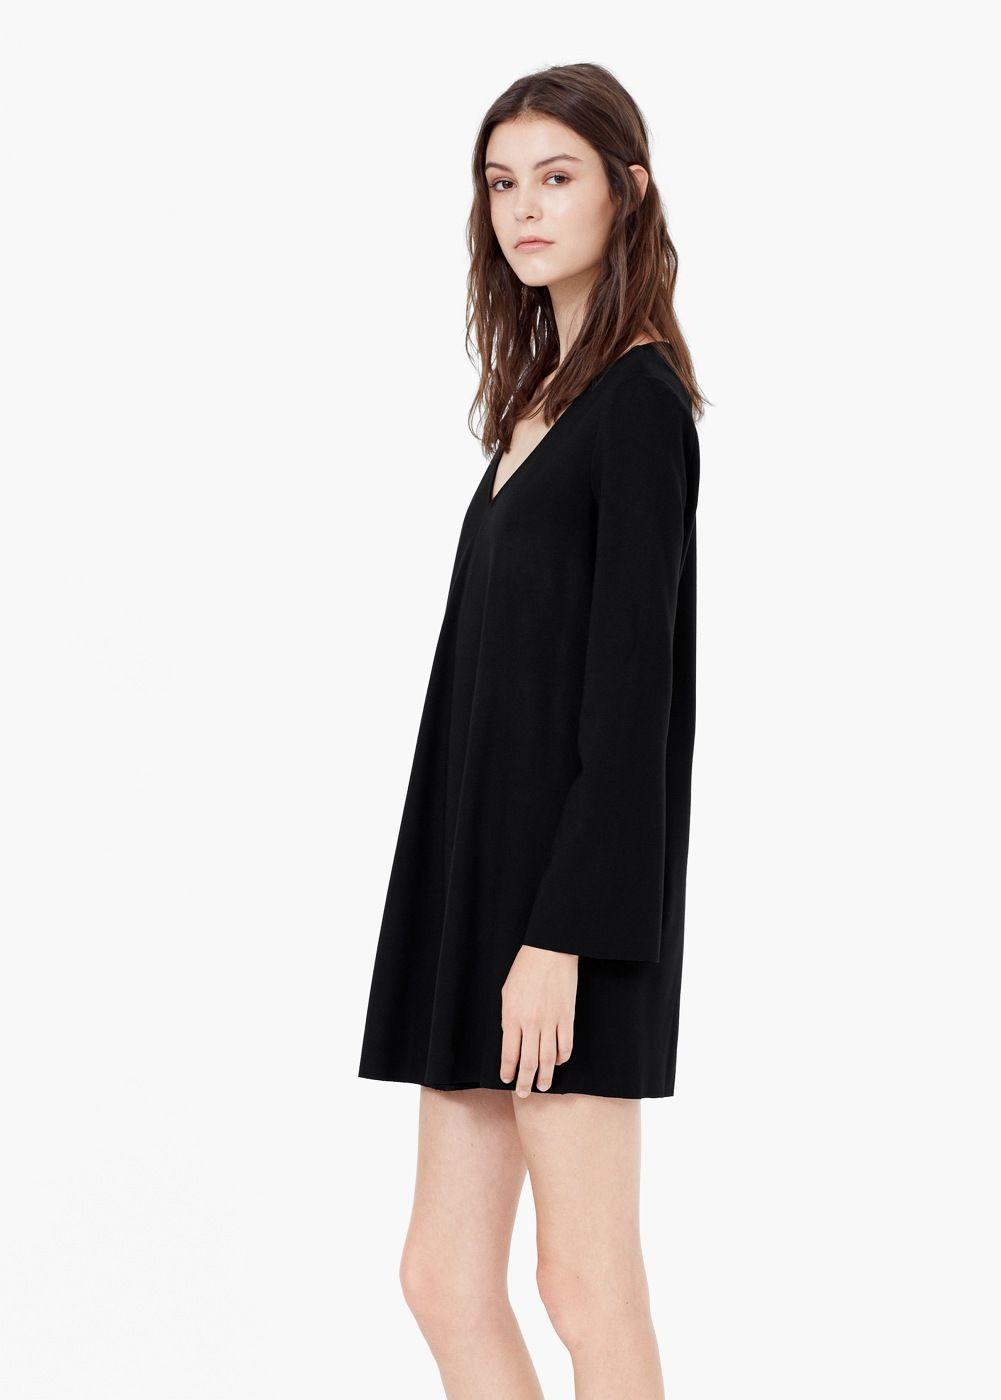 Robe col en v - Femme en 2018   OOTD-tenue   Pinterest   Dresses ... 10e2083cc3a0